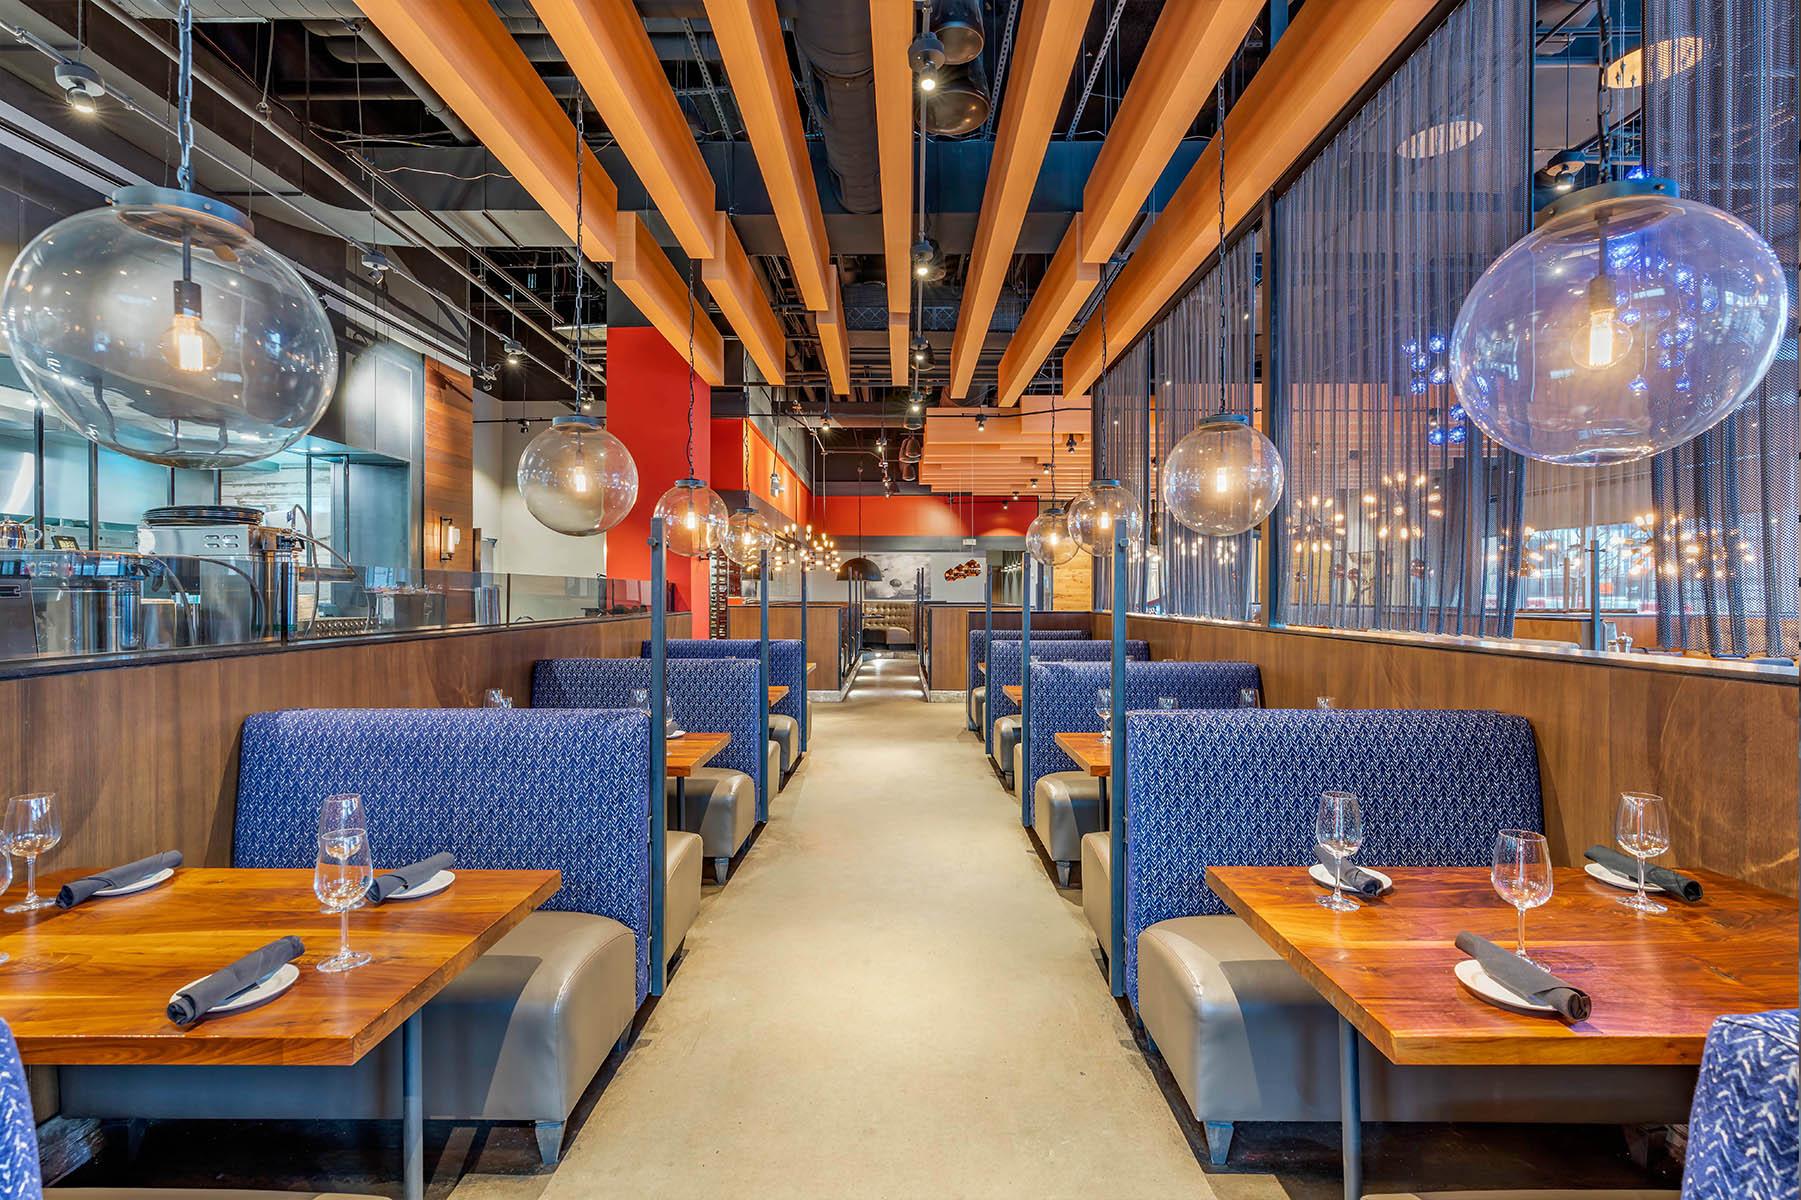 Modern Restaurant with Blue Booths